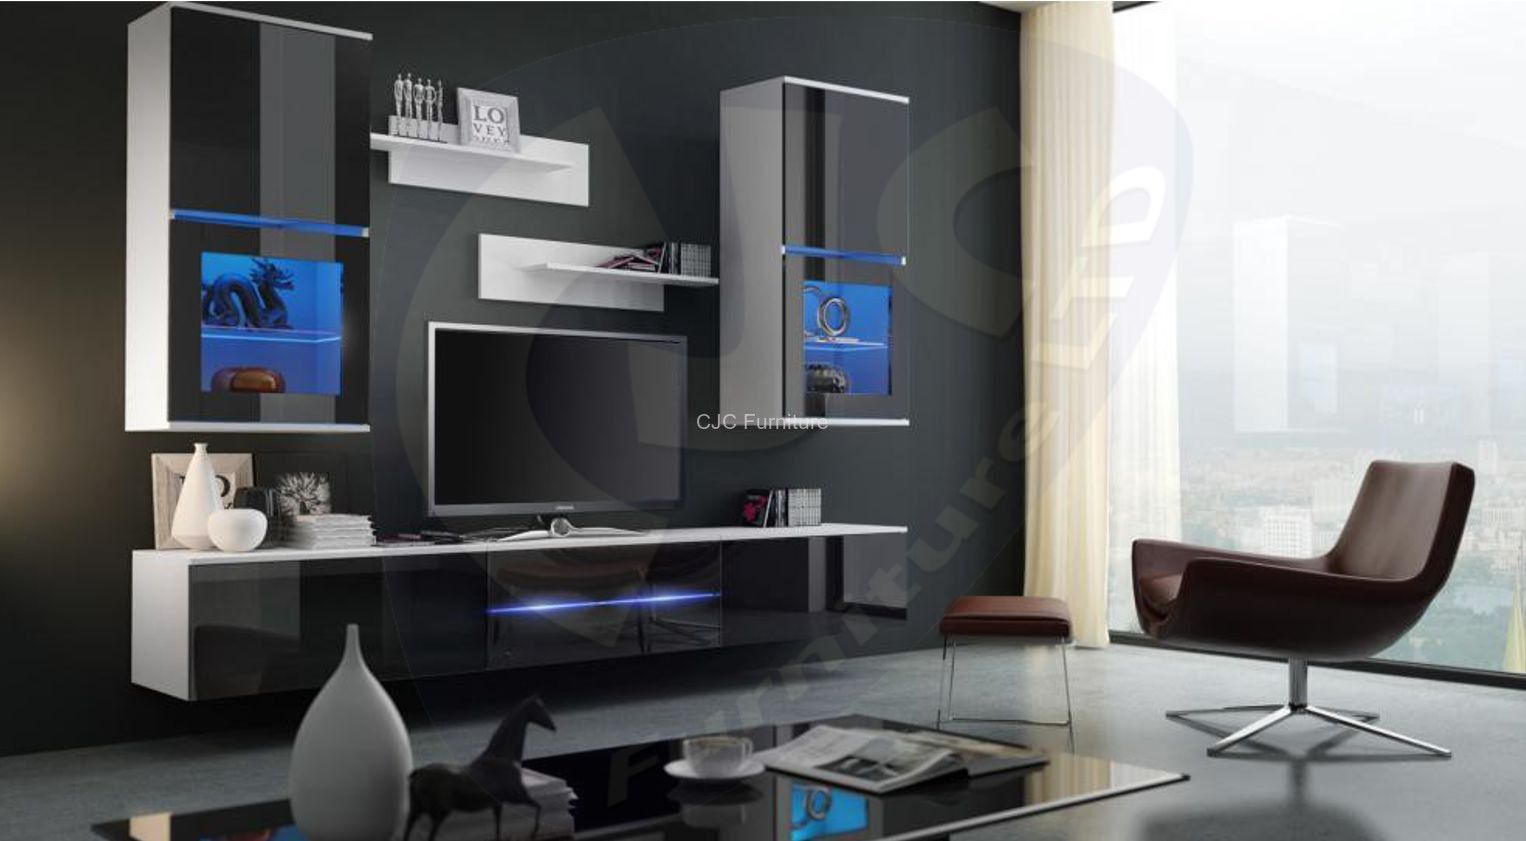 Living Room Furniture Set Wall 3 Section Tv Unit Cabinet Shelves Black &  White